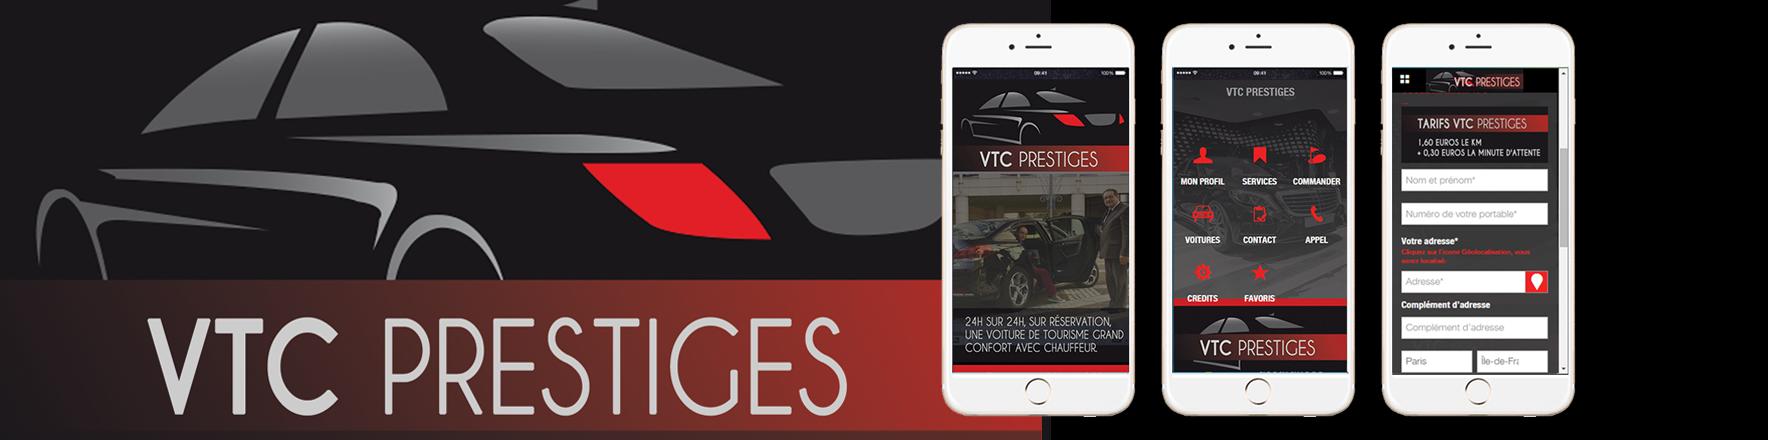 publication de l 39 application mobile vtc prestige commander une voiture par g olocalisation. Black Bedroom Furniture Sets. Home Design Ideas